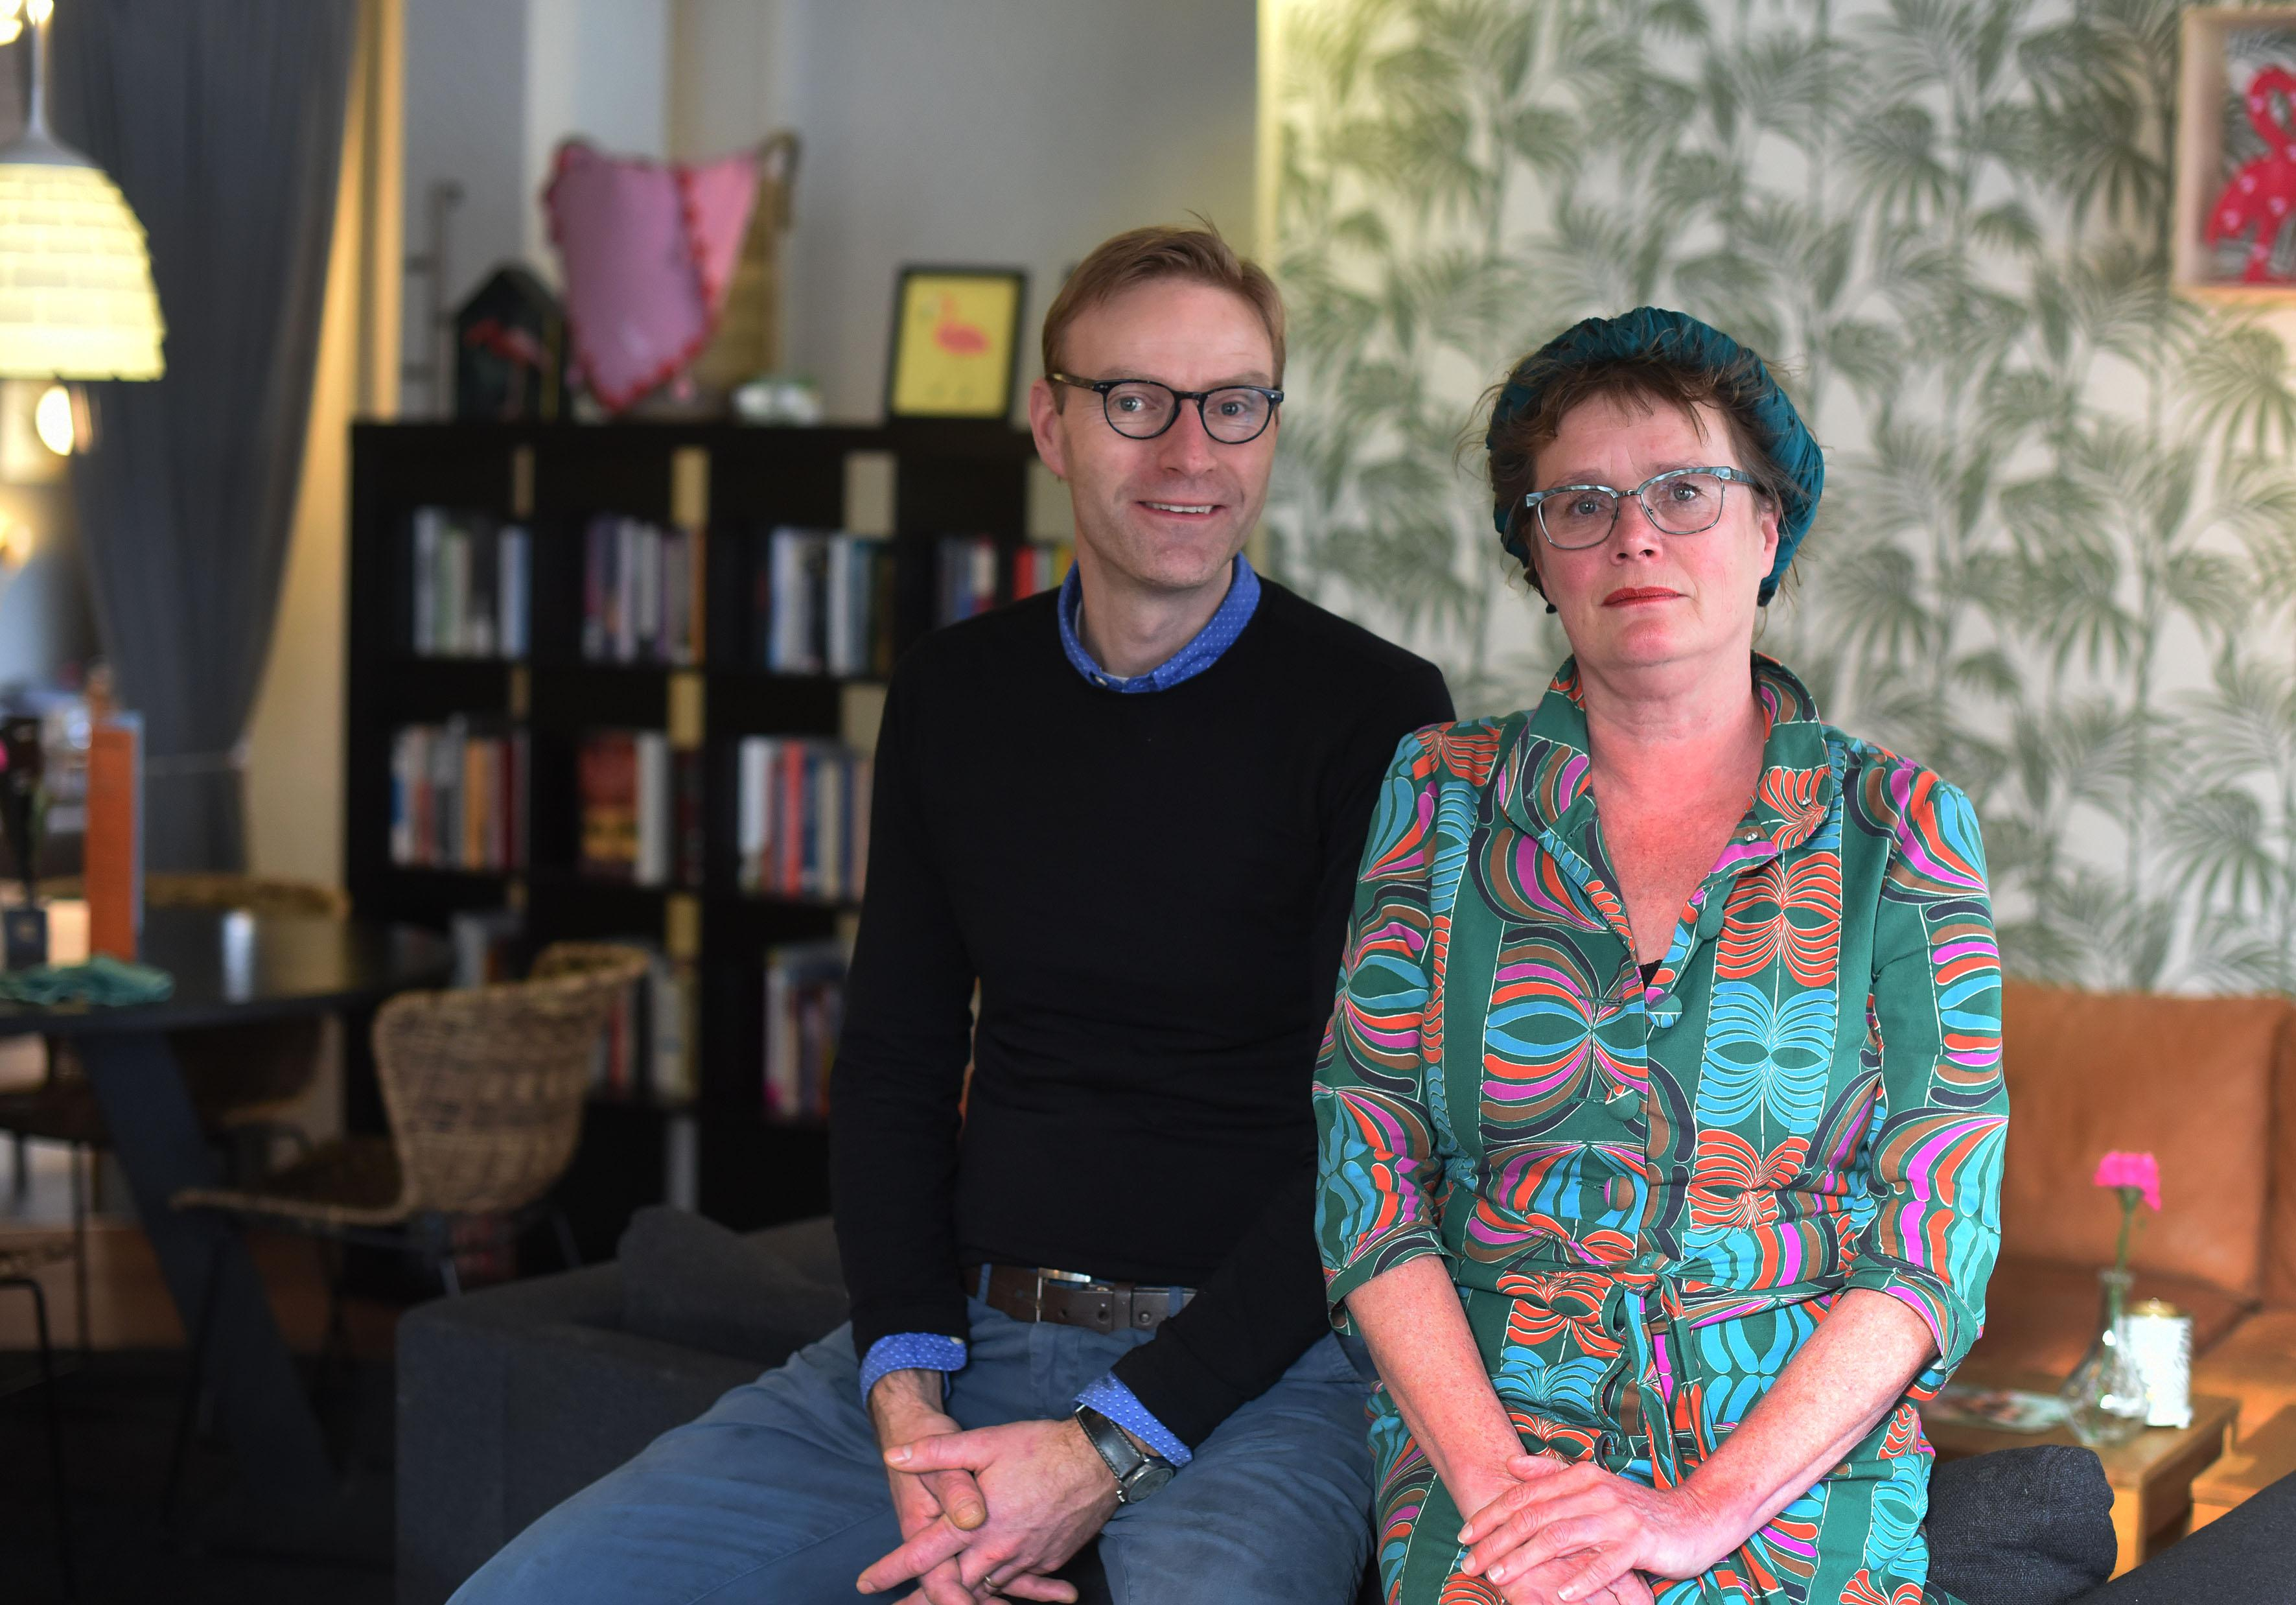 Nieuwkomers en Nederlanders ontmoeten in Hoorn